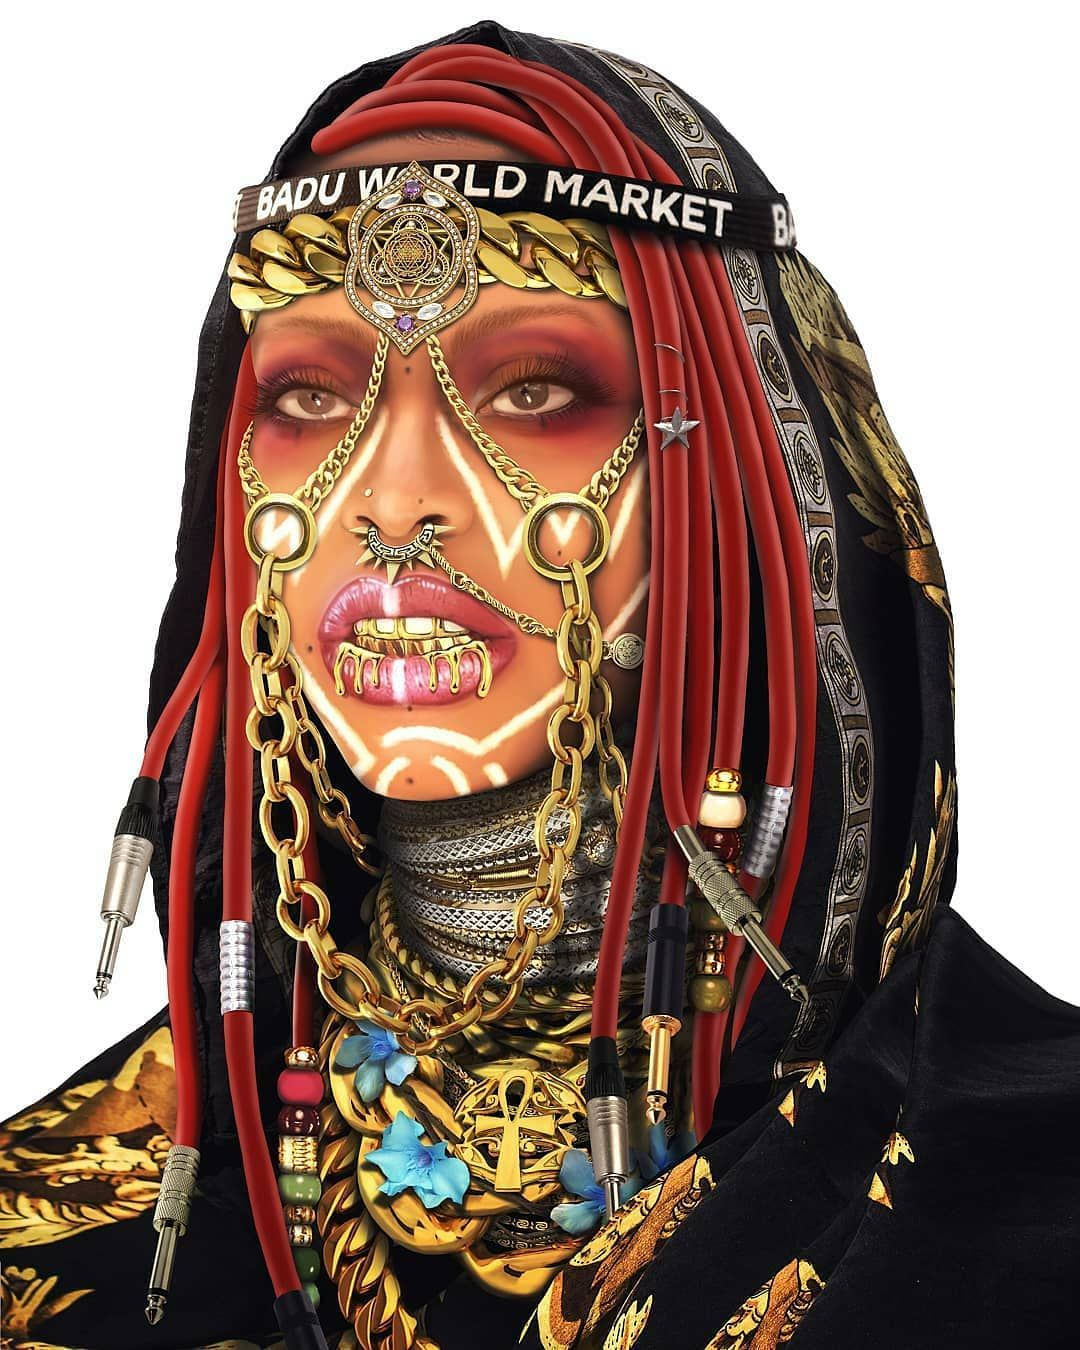 😍💙 #Dopeblackart by @yung.yemi x @erykahbadu   #photography#blackart #artoftheday#artfeature #artdaily #igart#digitaldrawing #realisticdrawing #pencildrawing #artspotlight #igartist #drawing #coolart #dopeart #blackartwork #artgallery #supportblackart #blackartist #coolartwork #artfido#artlife #artwork #dopeblackartist